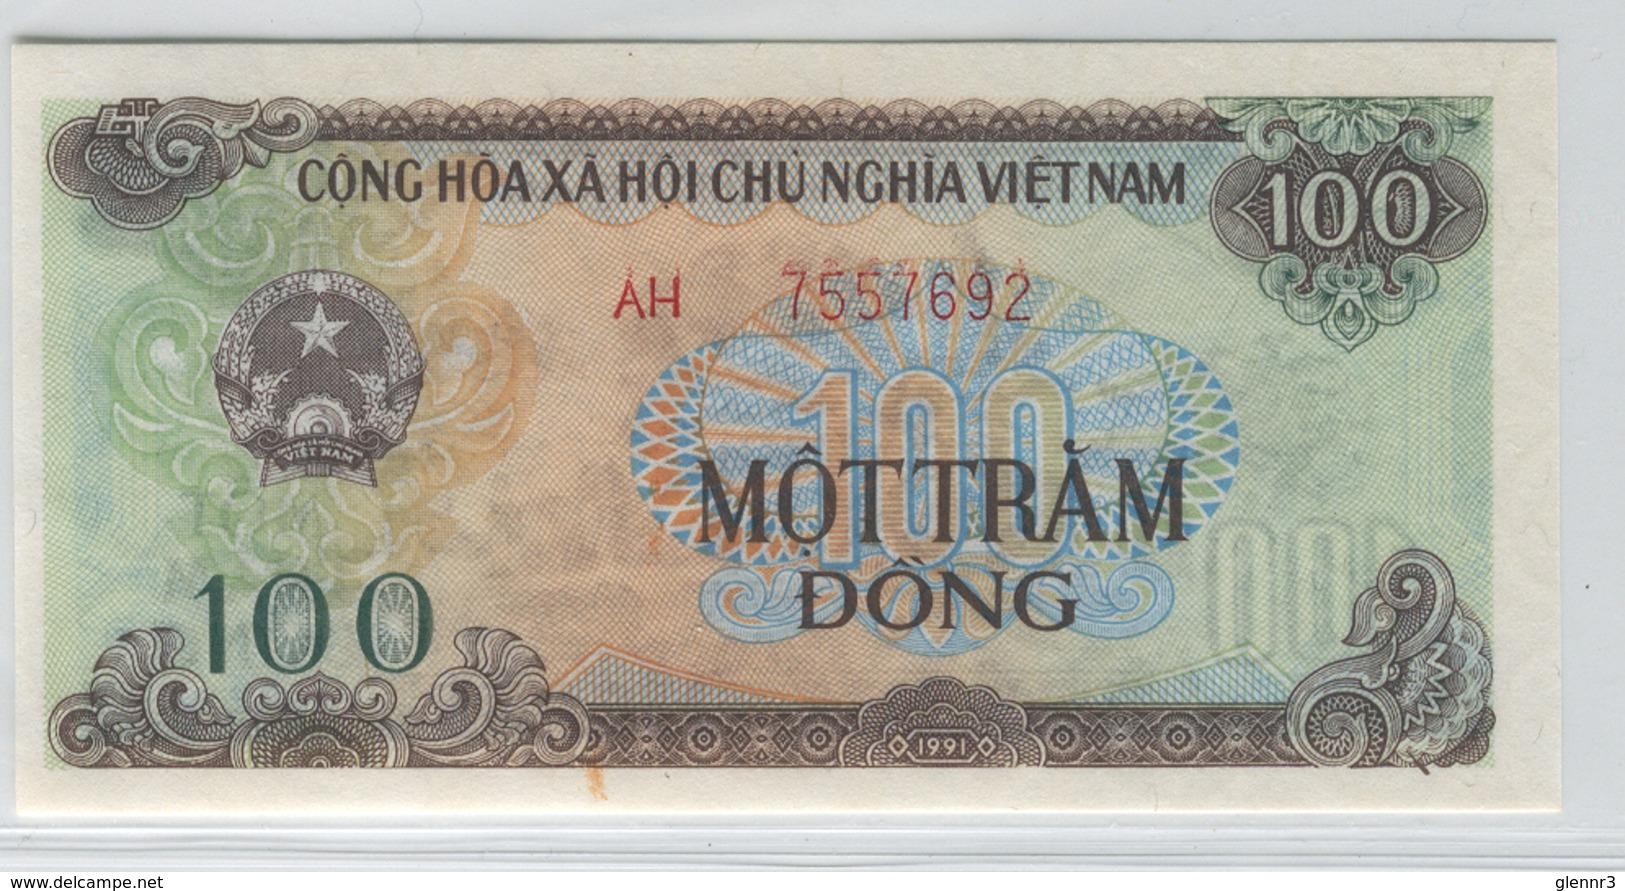 VIET NAM 105 1991 100 Dong UNC - Vietnam